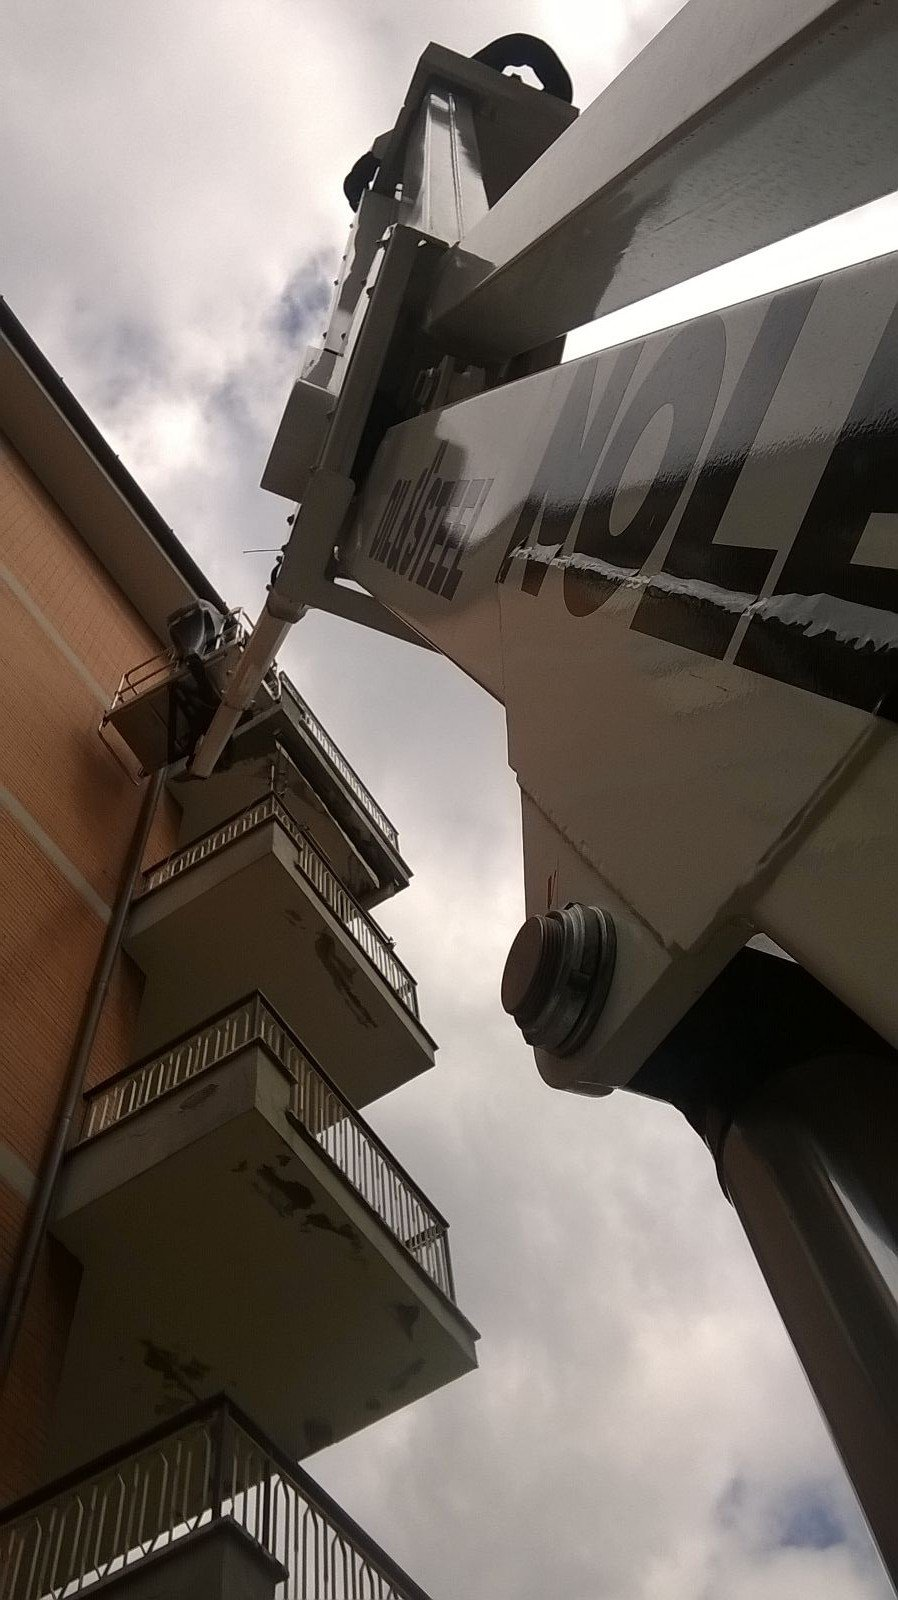 Noleggio piattaforme aeree Rieti